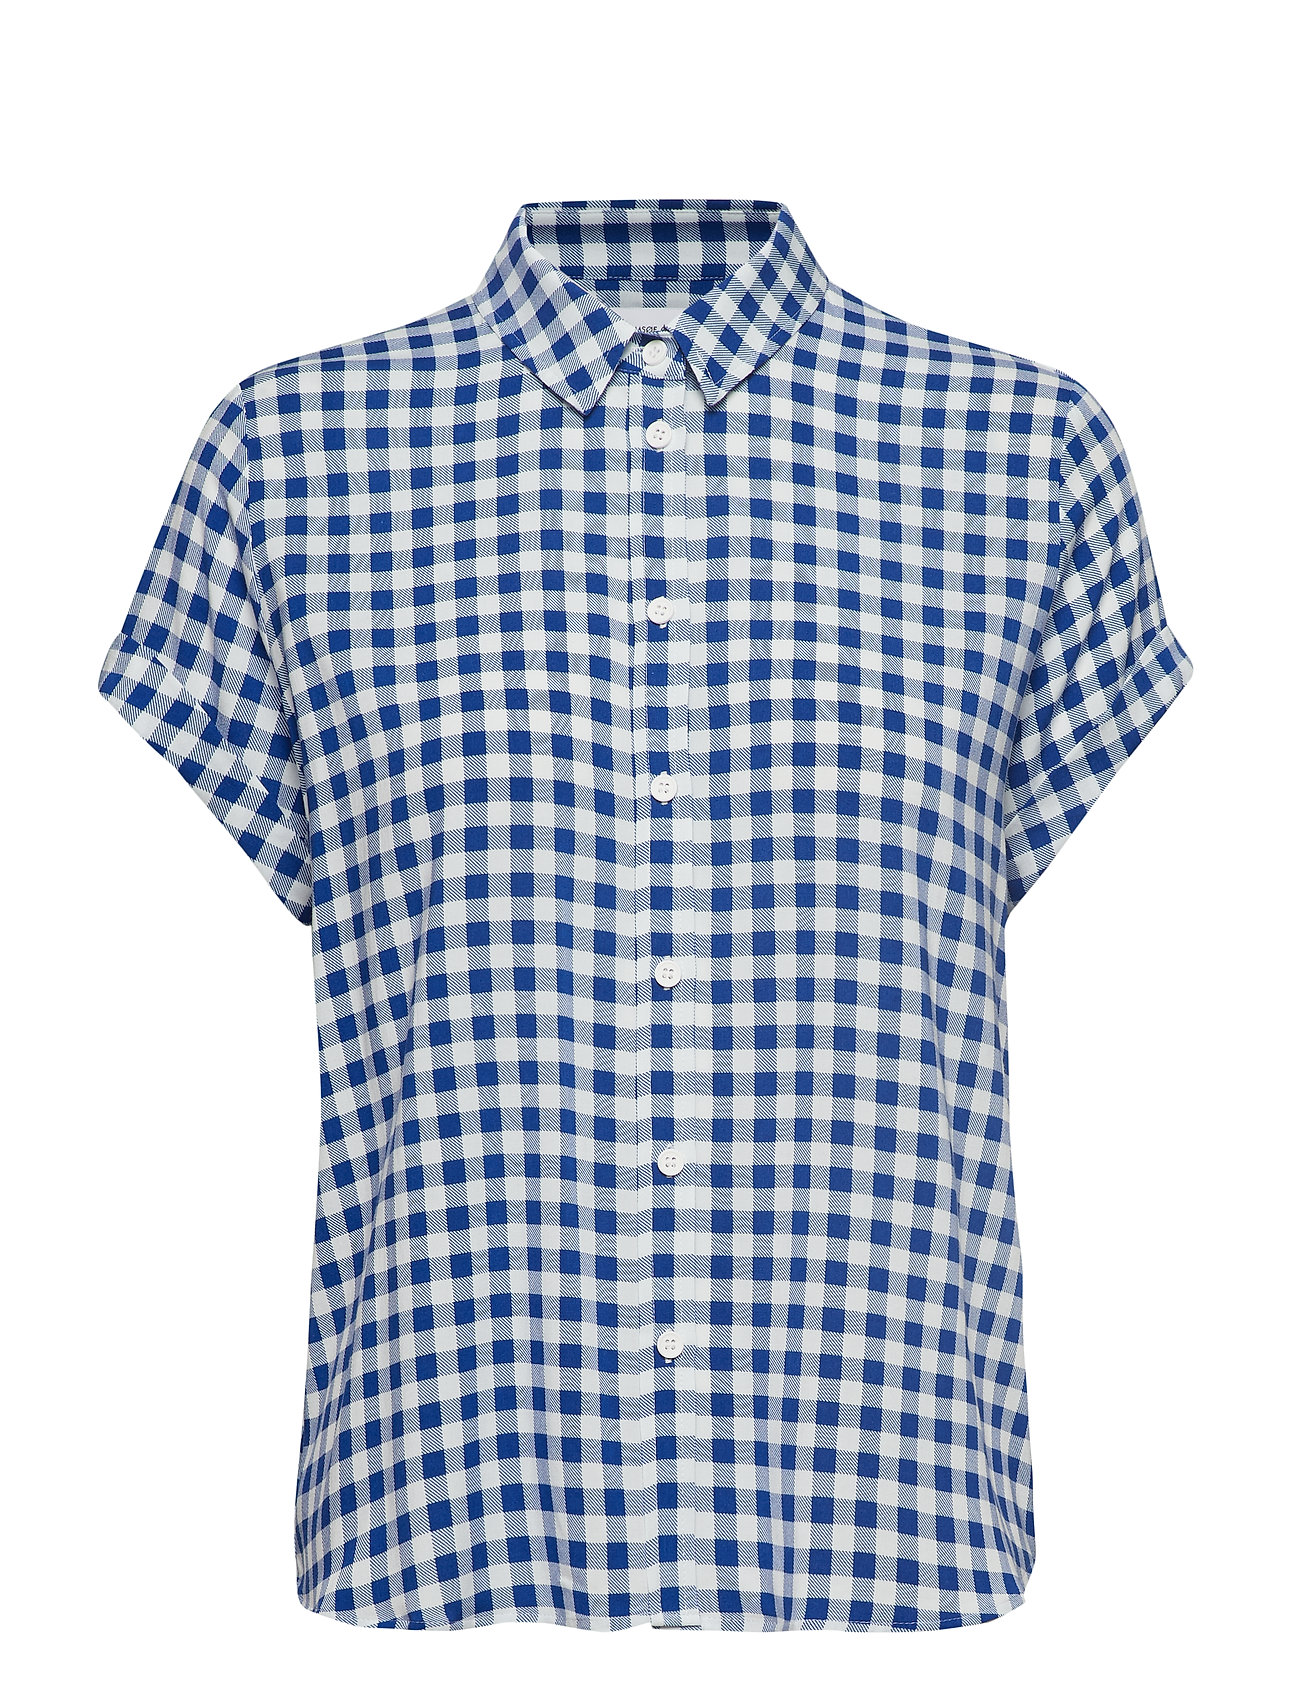 Samsøe & Samsøe Majan ss shirt aop 9942